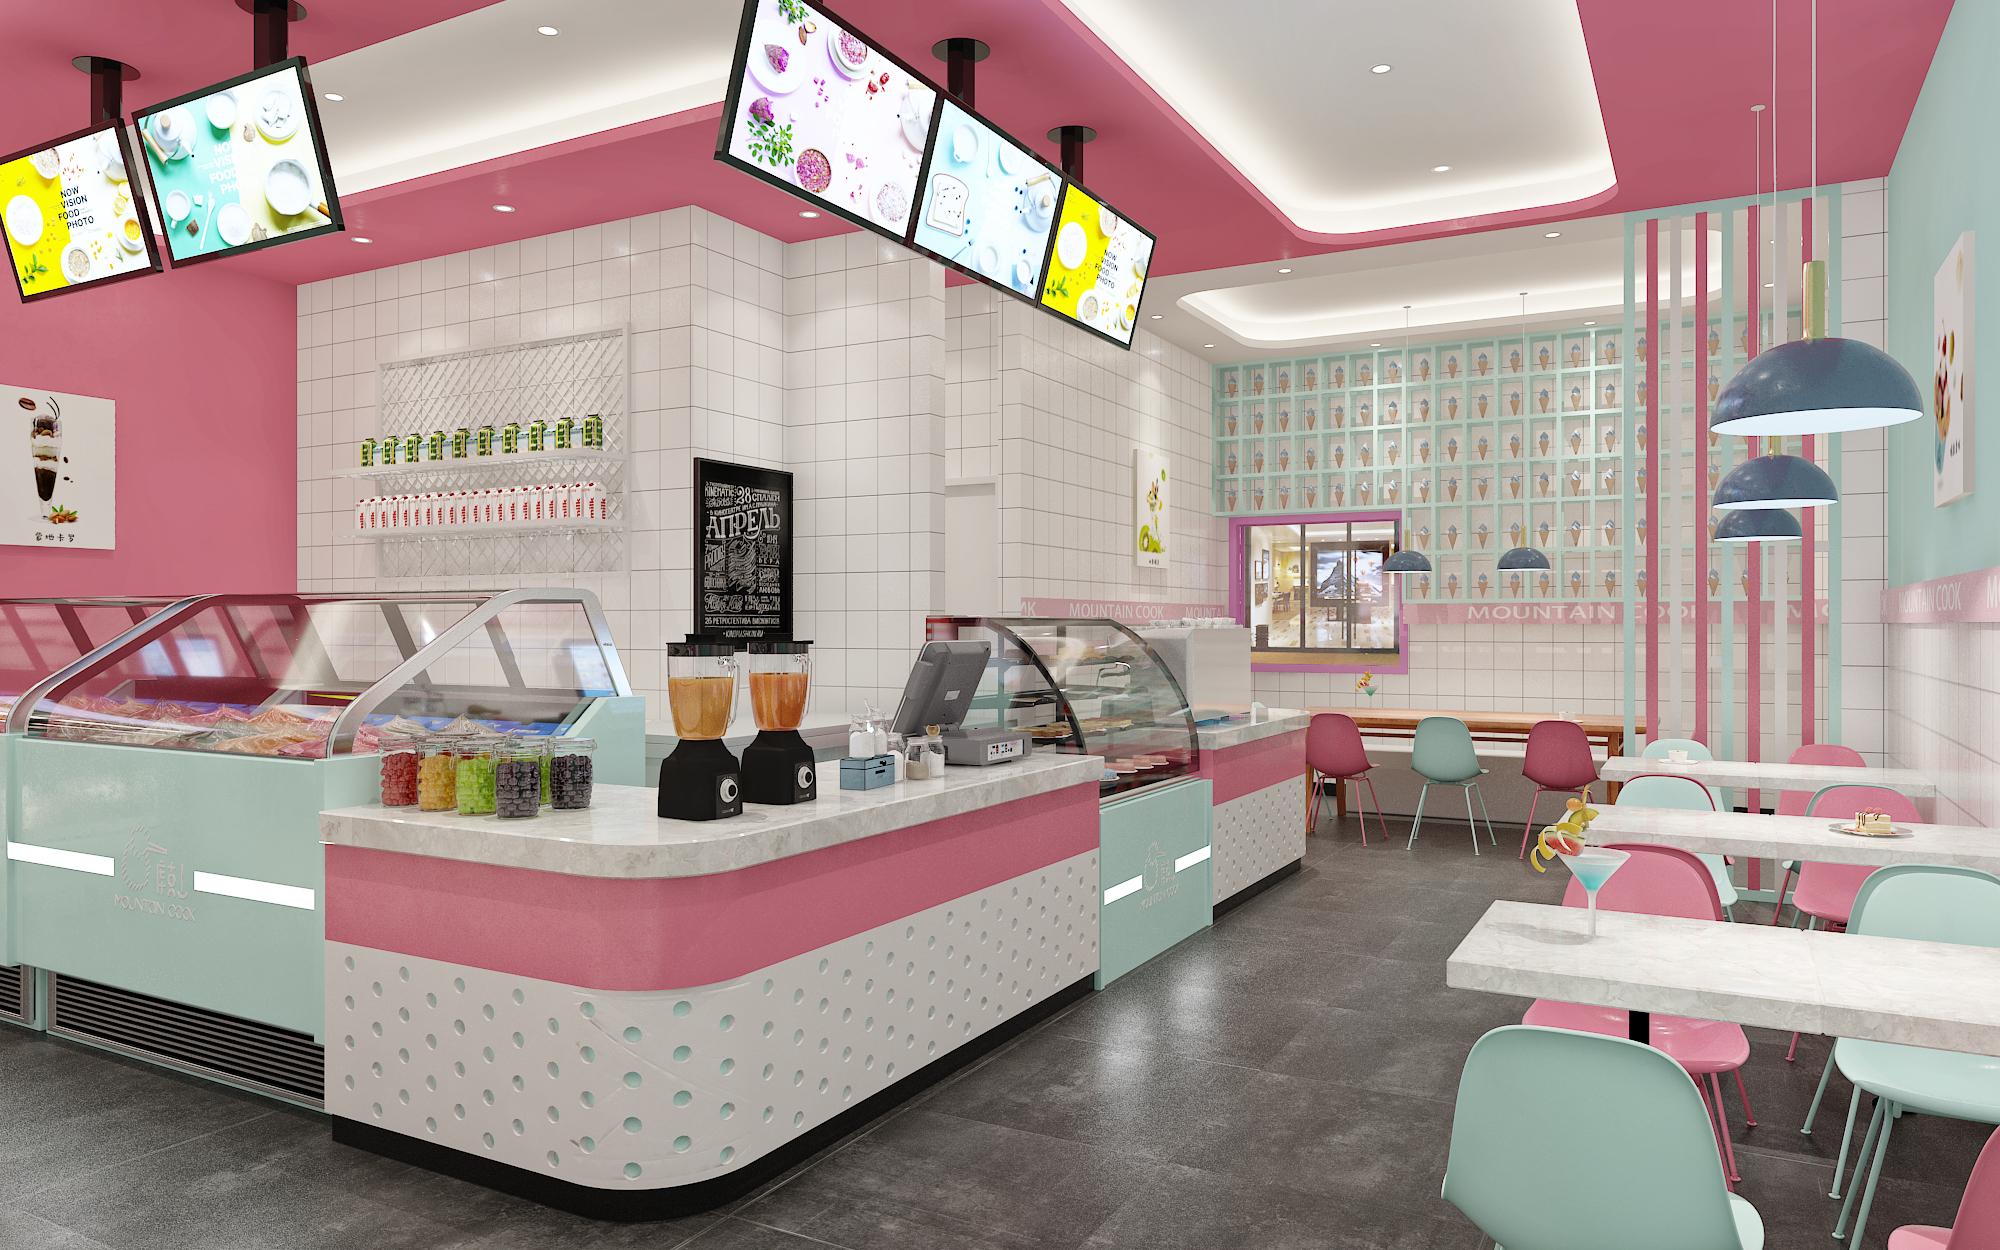 库克山冰淇淋